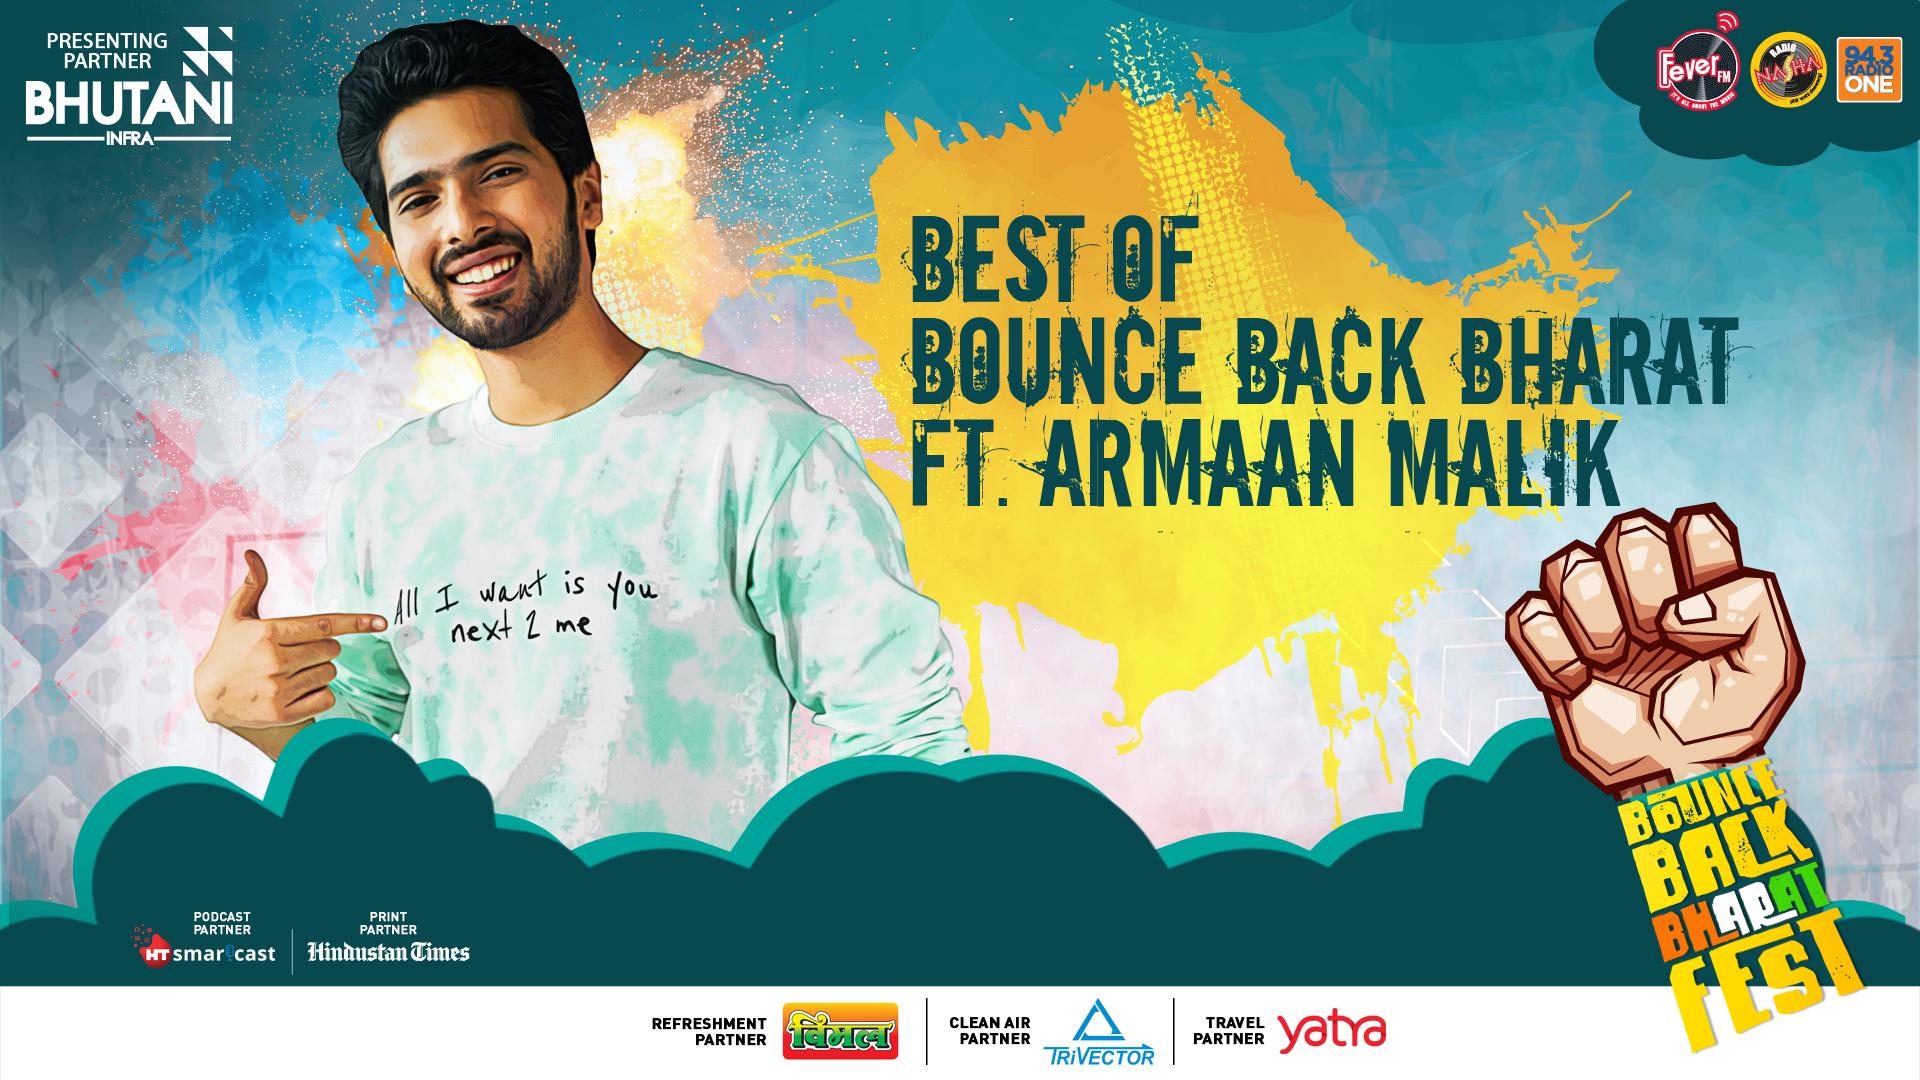 Armaan Malik at bounce back bharat